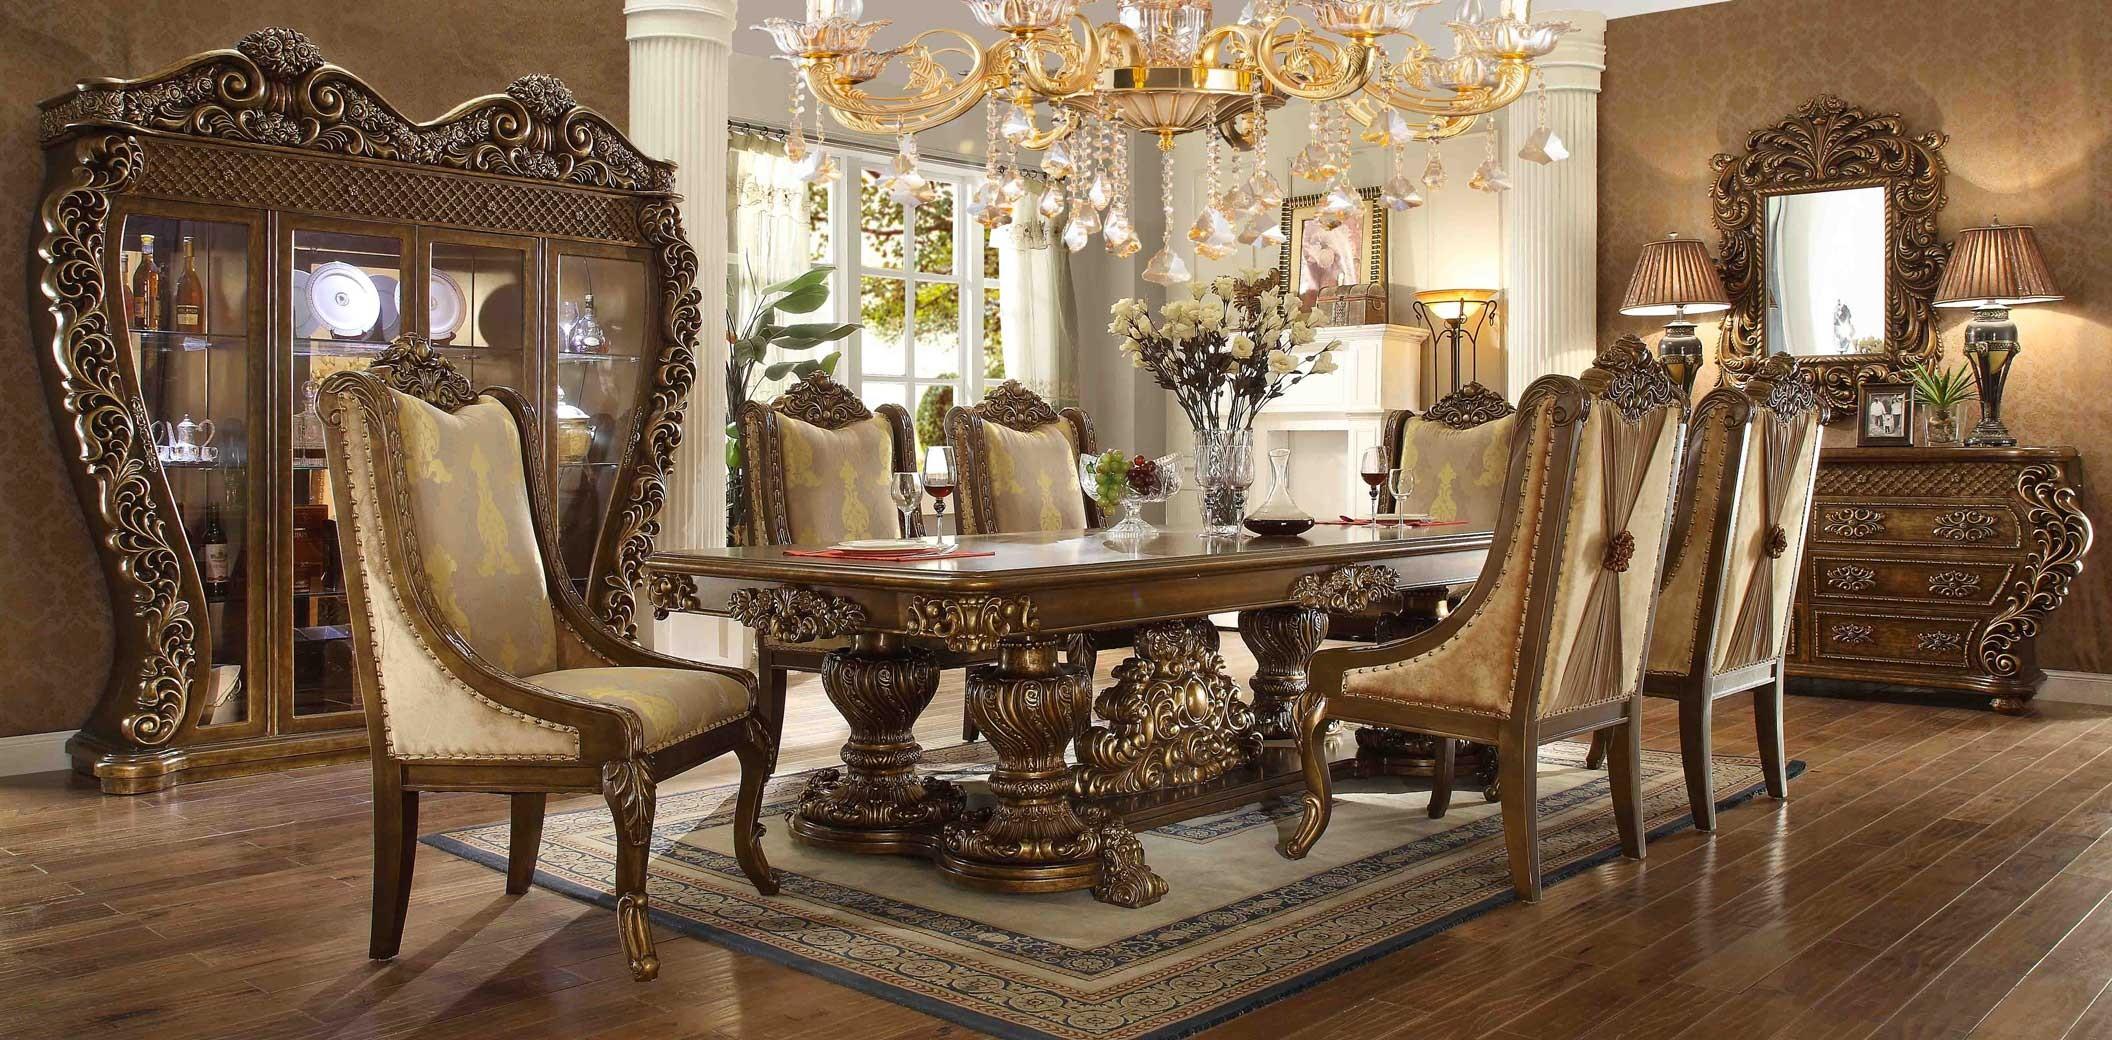 New England Fall Themed Wallpaper Hd 8011 Homey Design Dining Room Set Victorian European